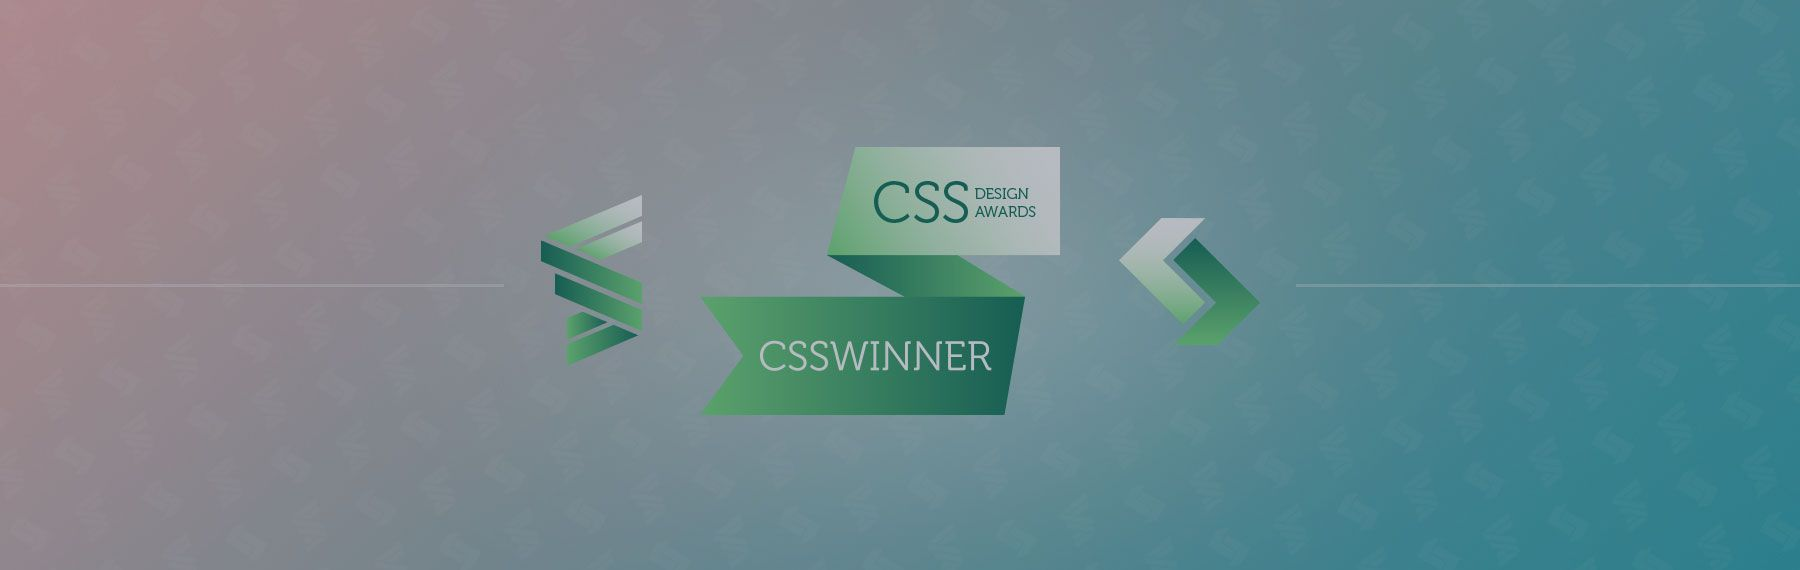 We've received CSS Design Awards and CSSWinner SOTW awards!